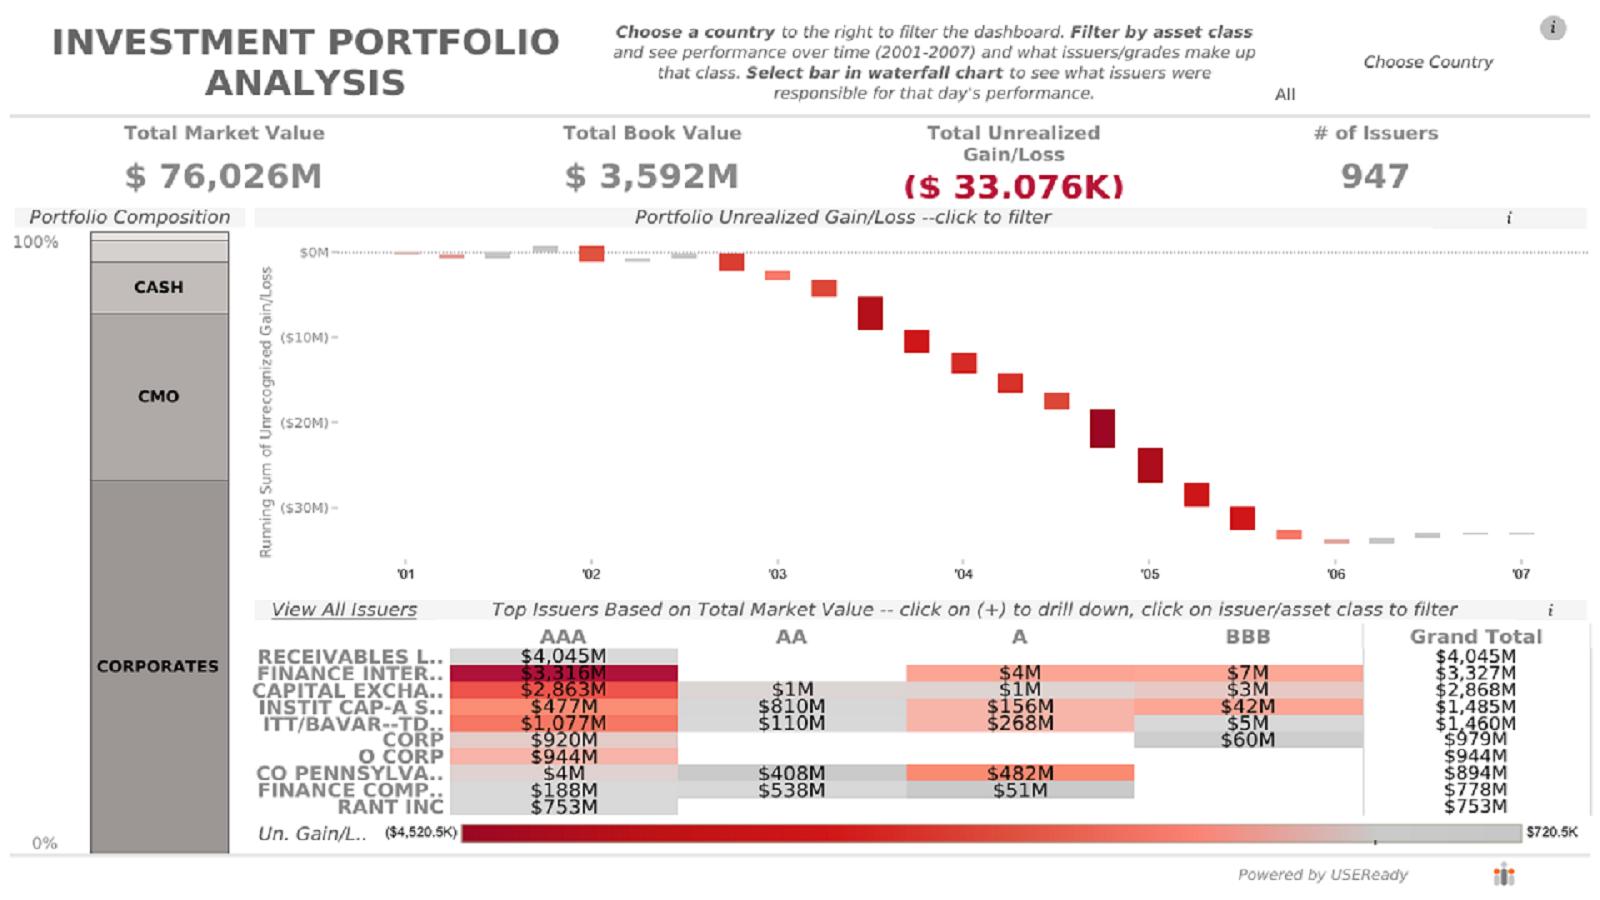 Investment Portfolio Analysis